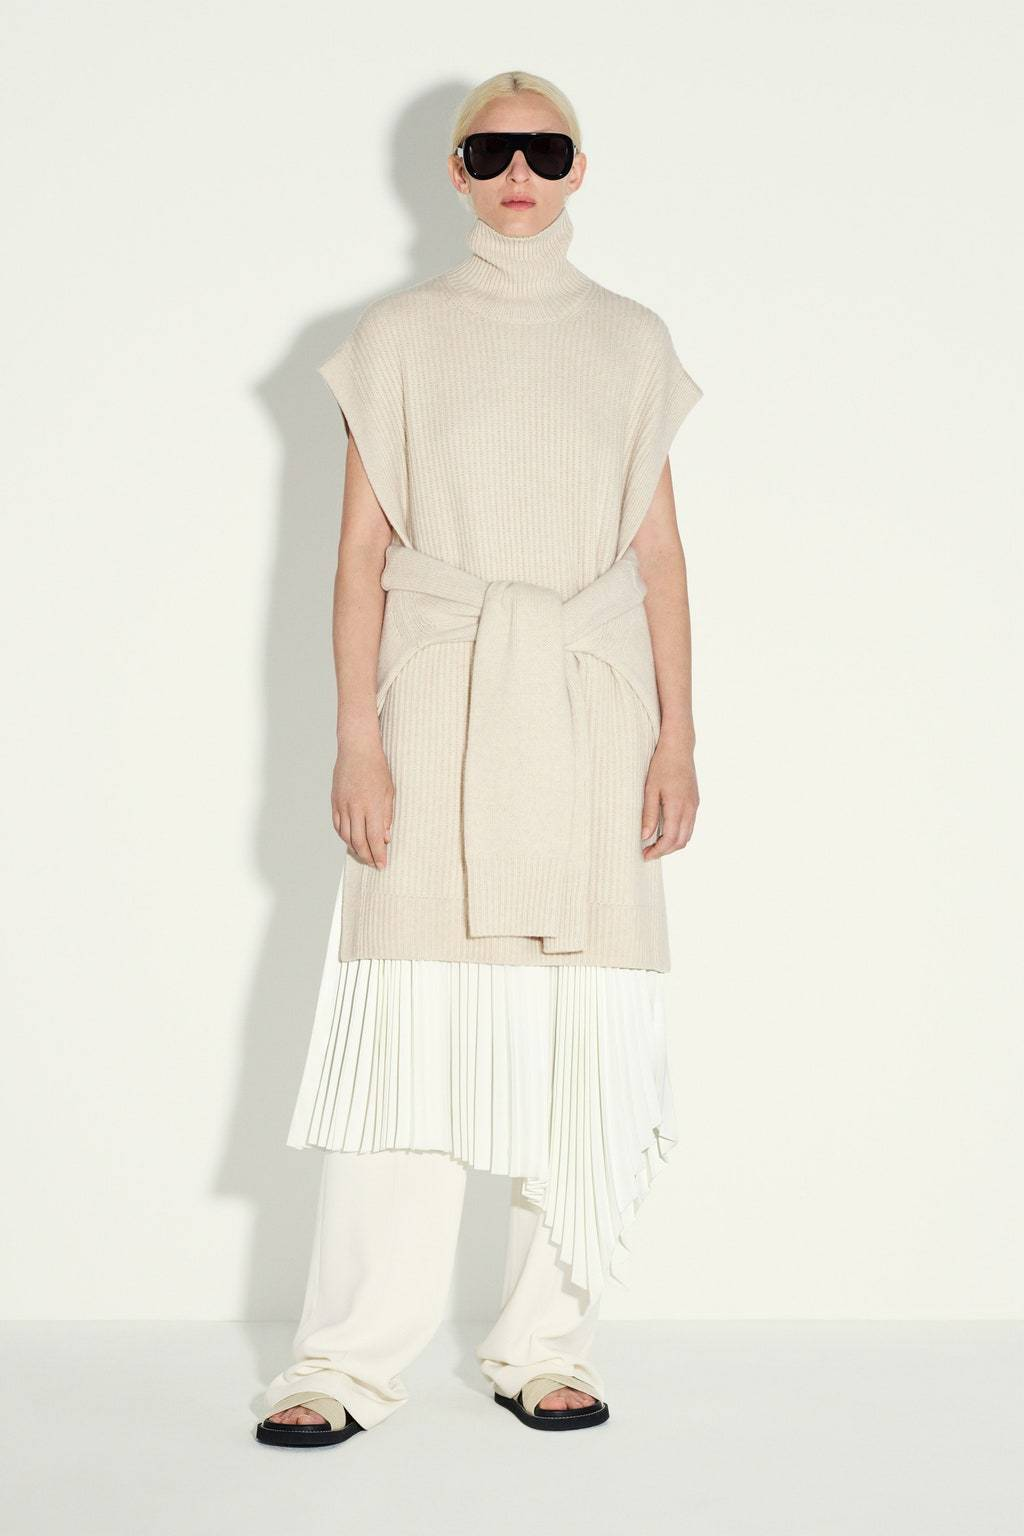 Joseph Resort 2021 <3!!!!! #joseph#resort 2021#fashion#minimal style